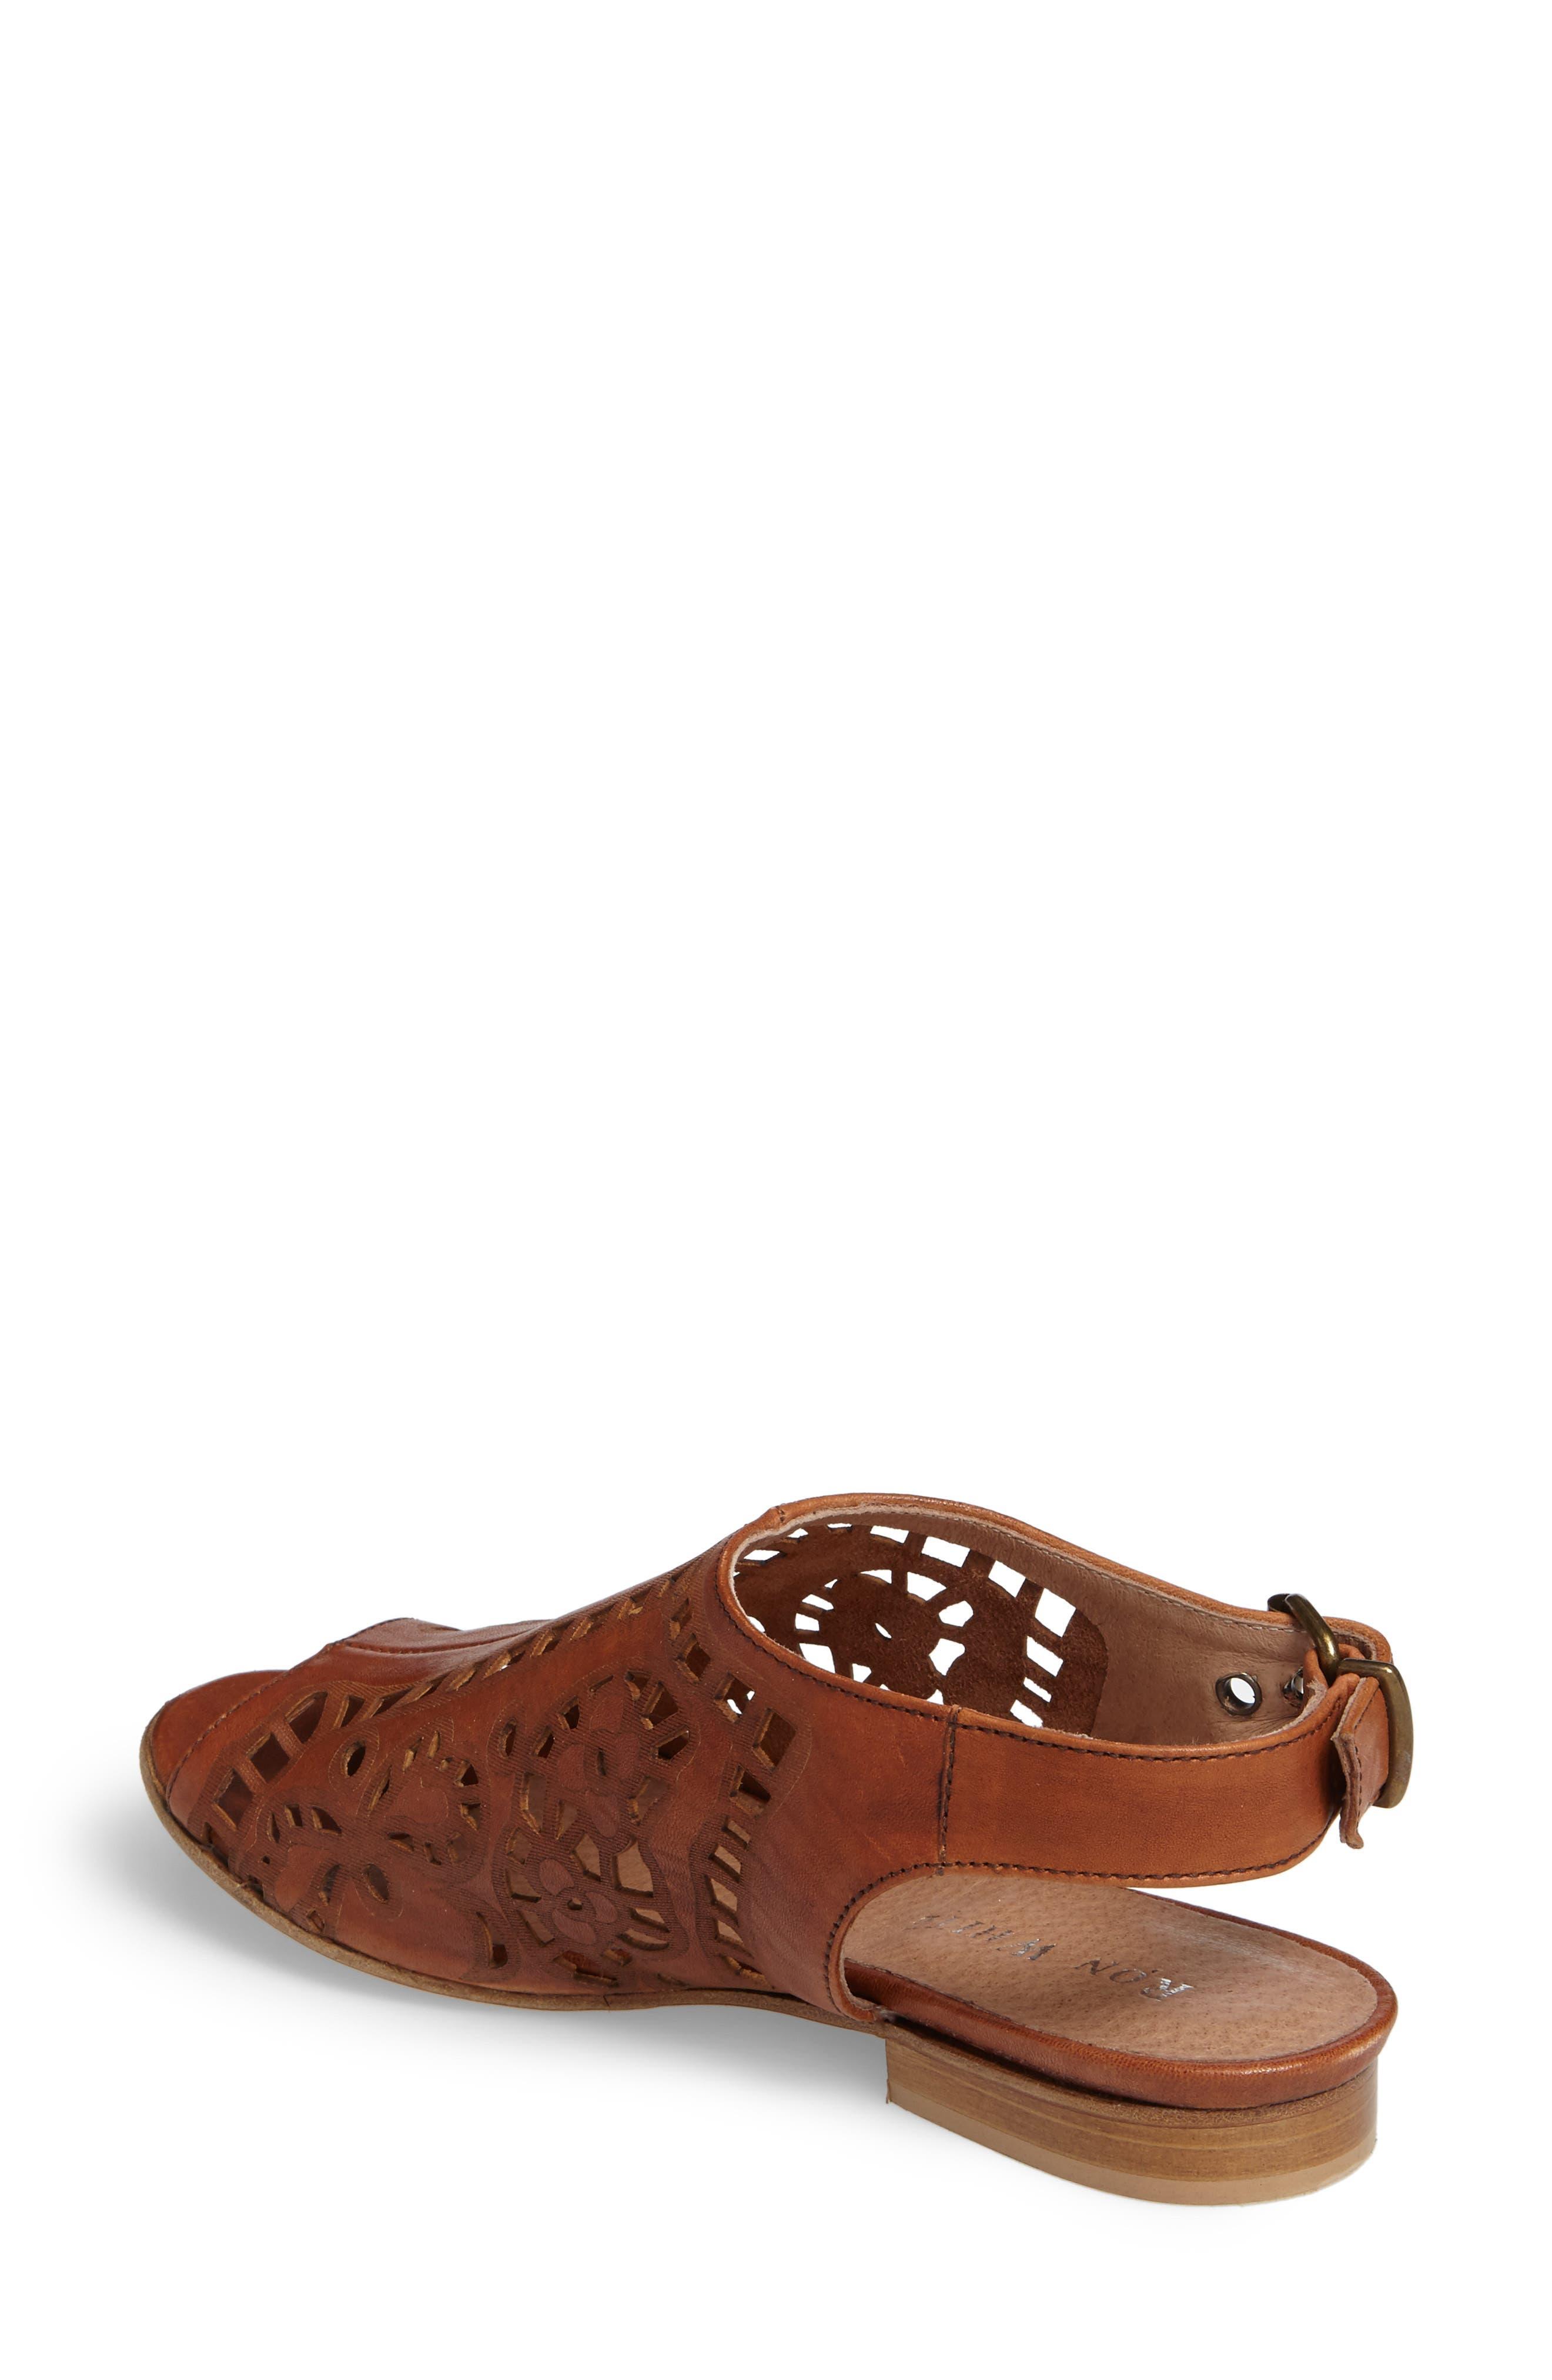 Ally Slingback Sandal,                             Alternate thumbnail 2, color,                             Cognac Leather